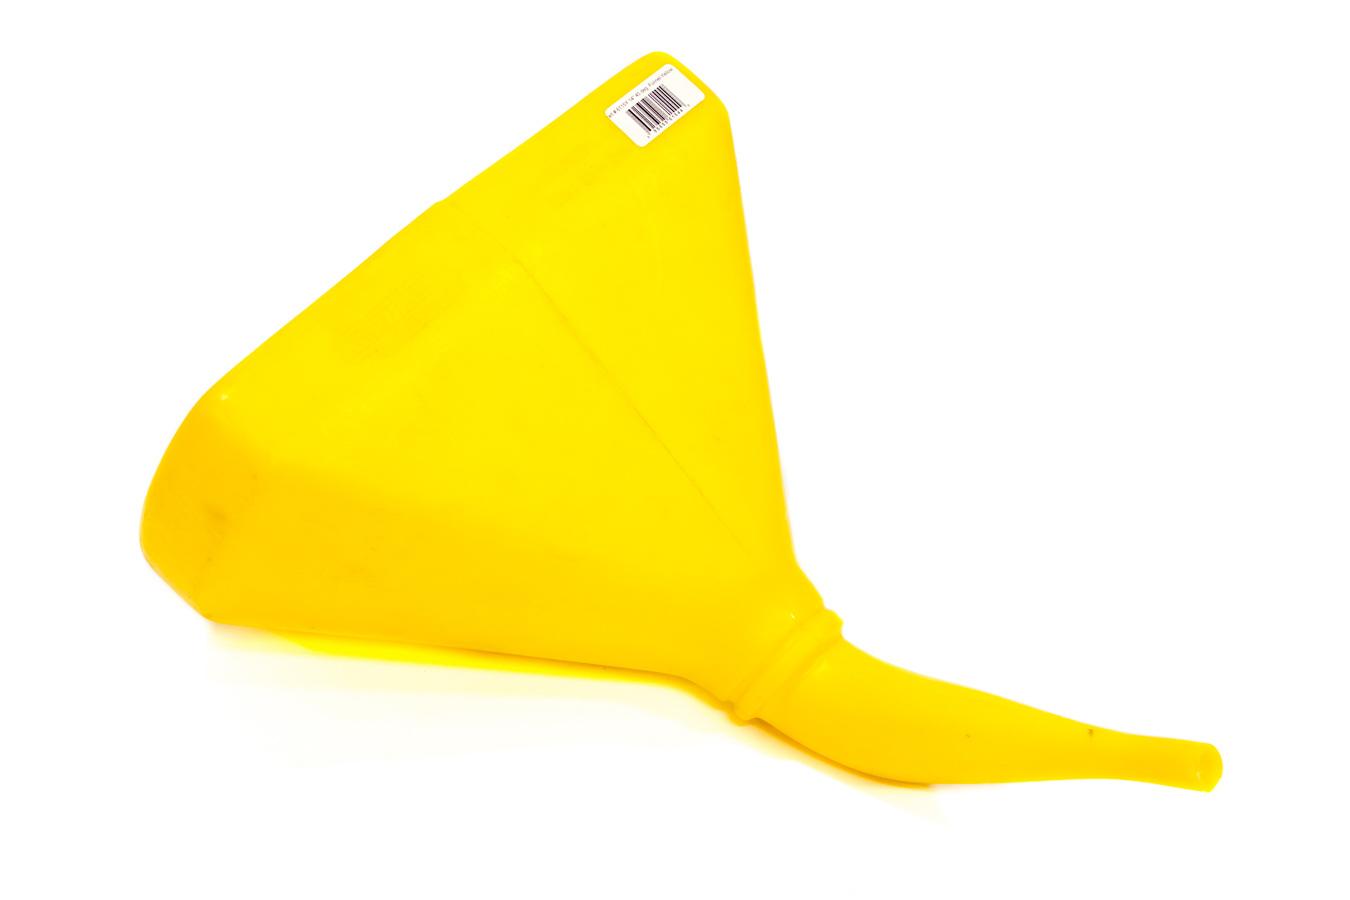 Scribner 6115Y Funnel, 14 in D-Shape, 45 Degree, Plastic, Yellow, Each